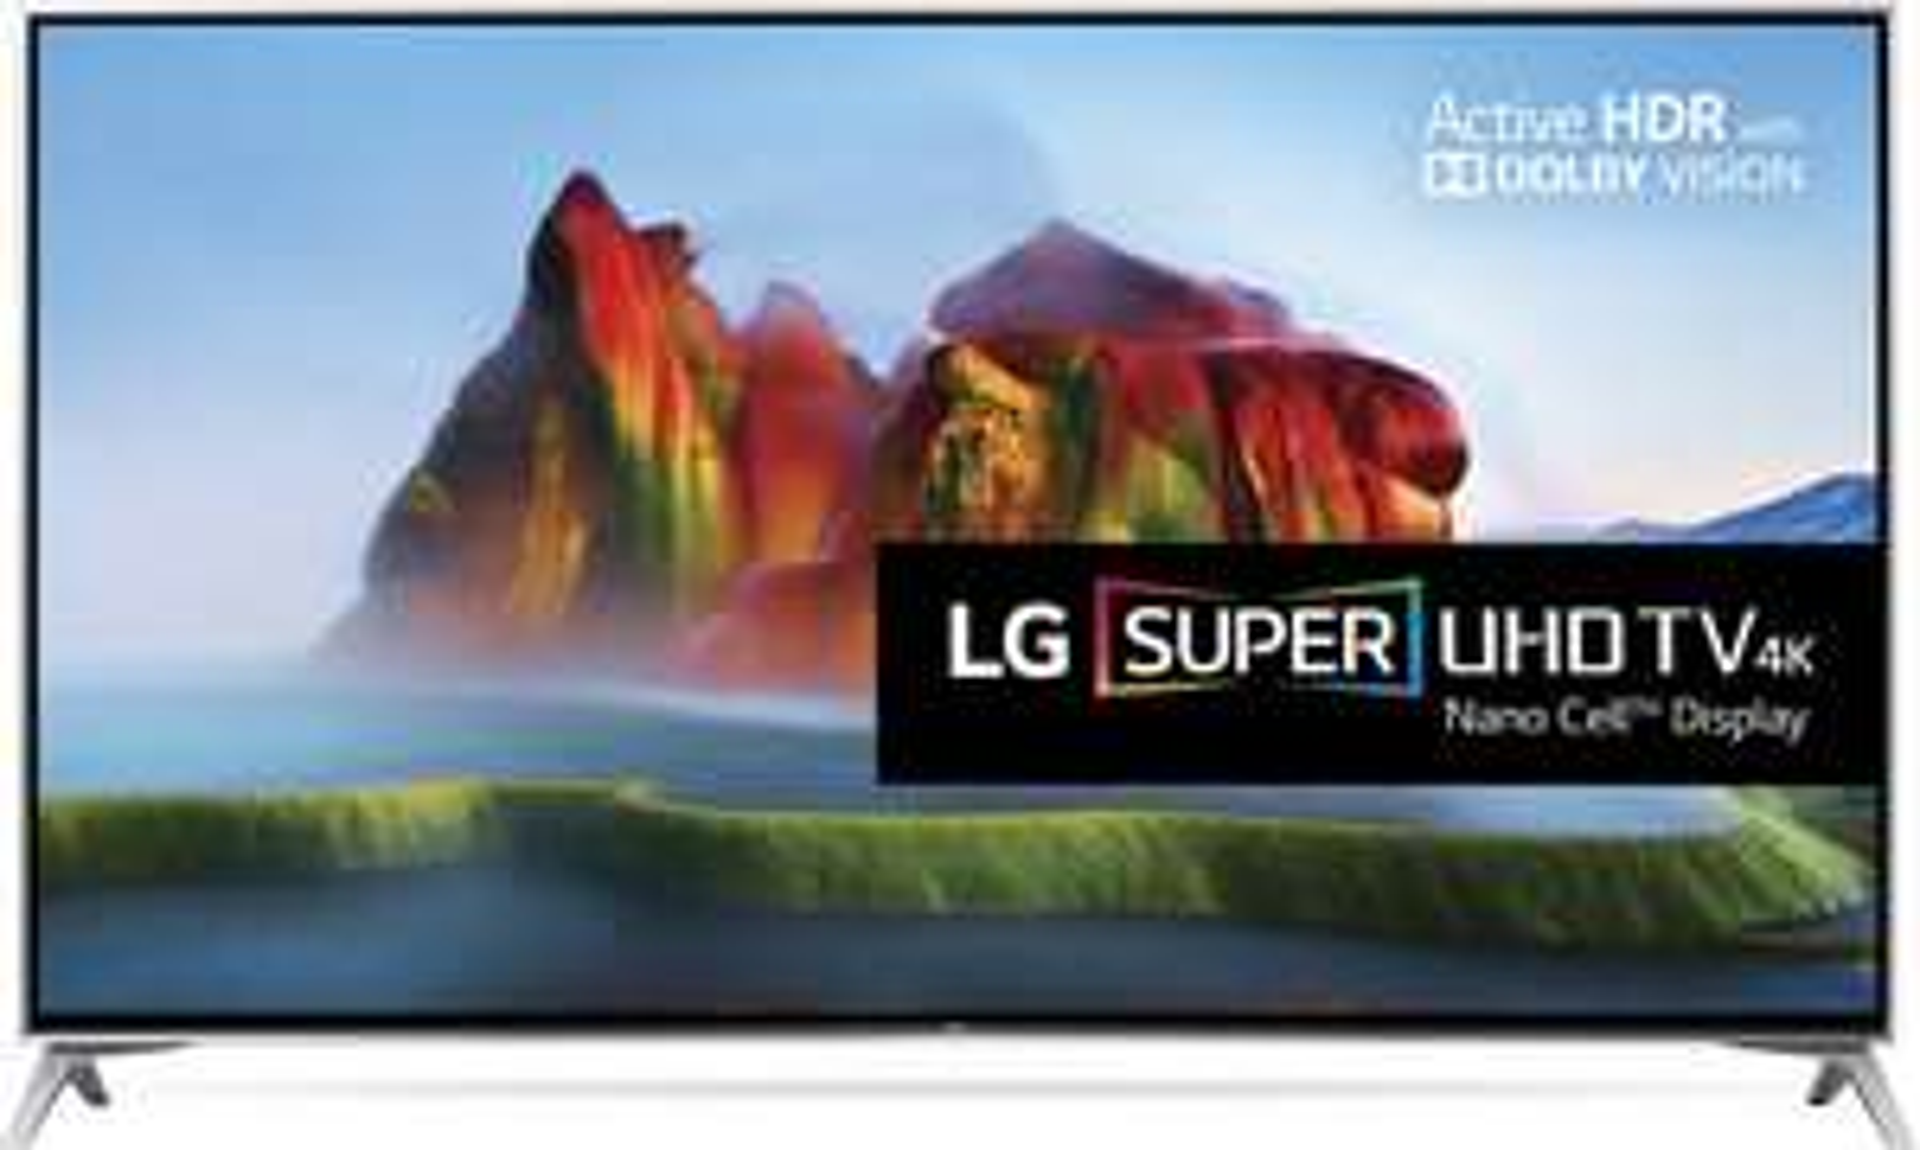 [MEDIA MARKT]LG 55SJ800 (100 hz. 10bit RGBW Panel)inkl. LG SH4 Soundbar